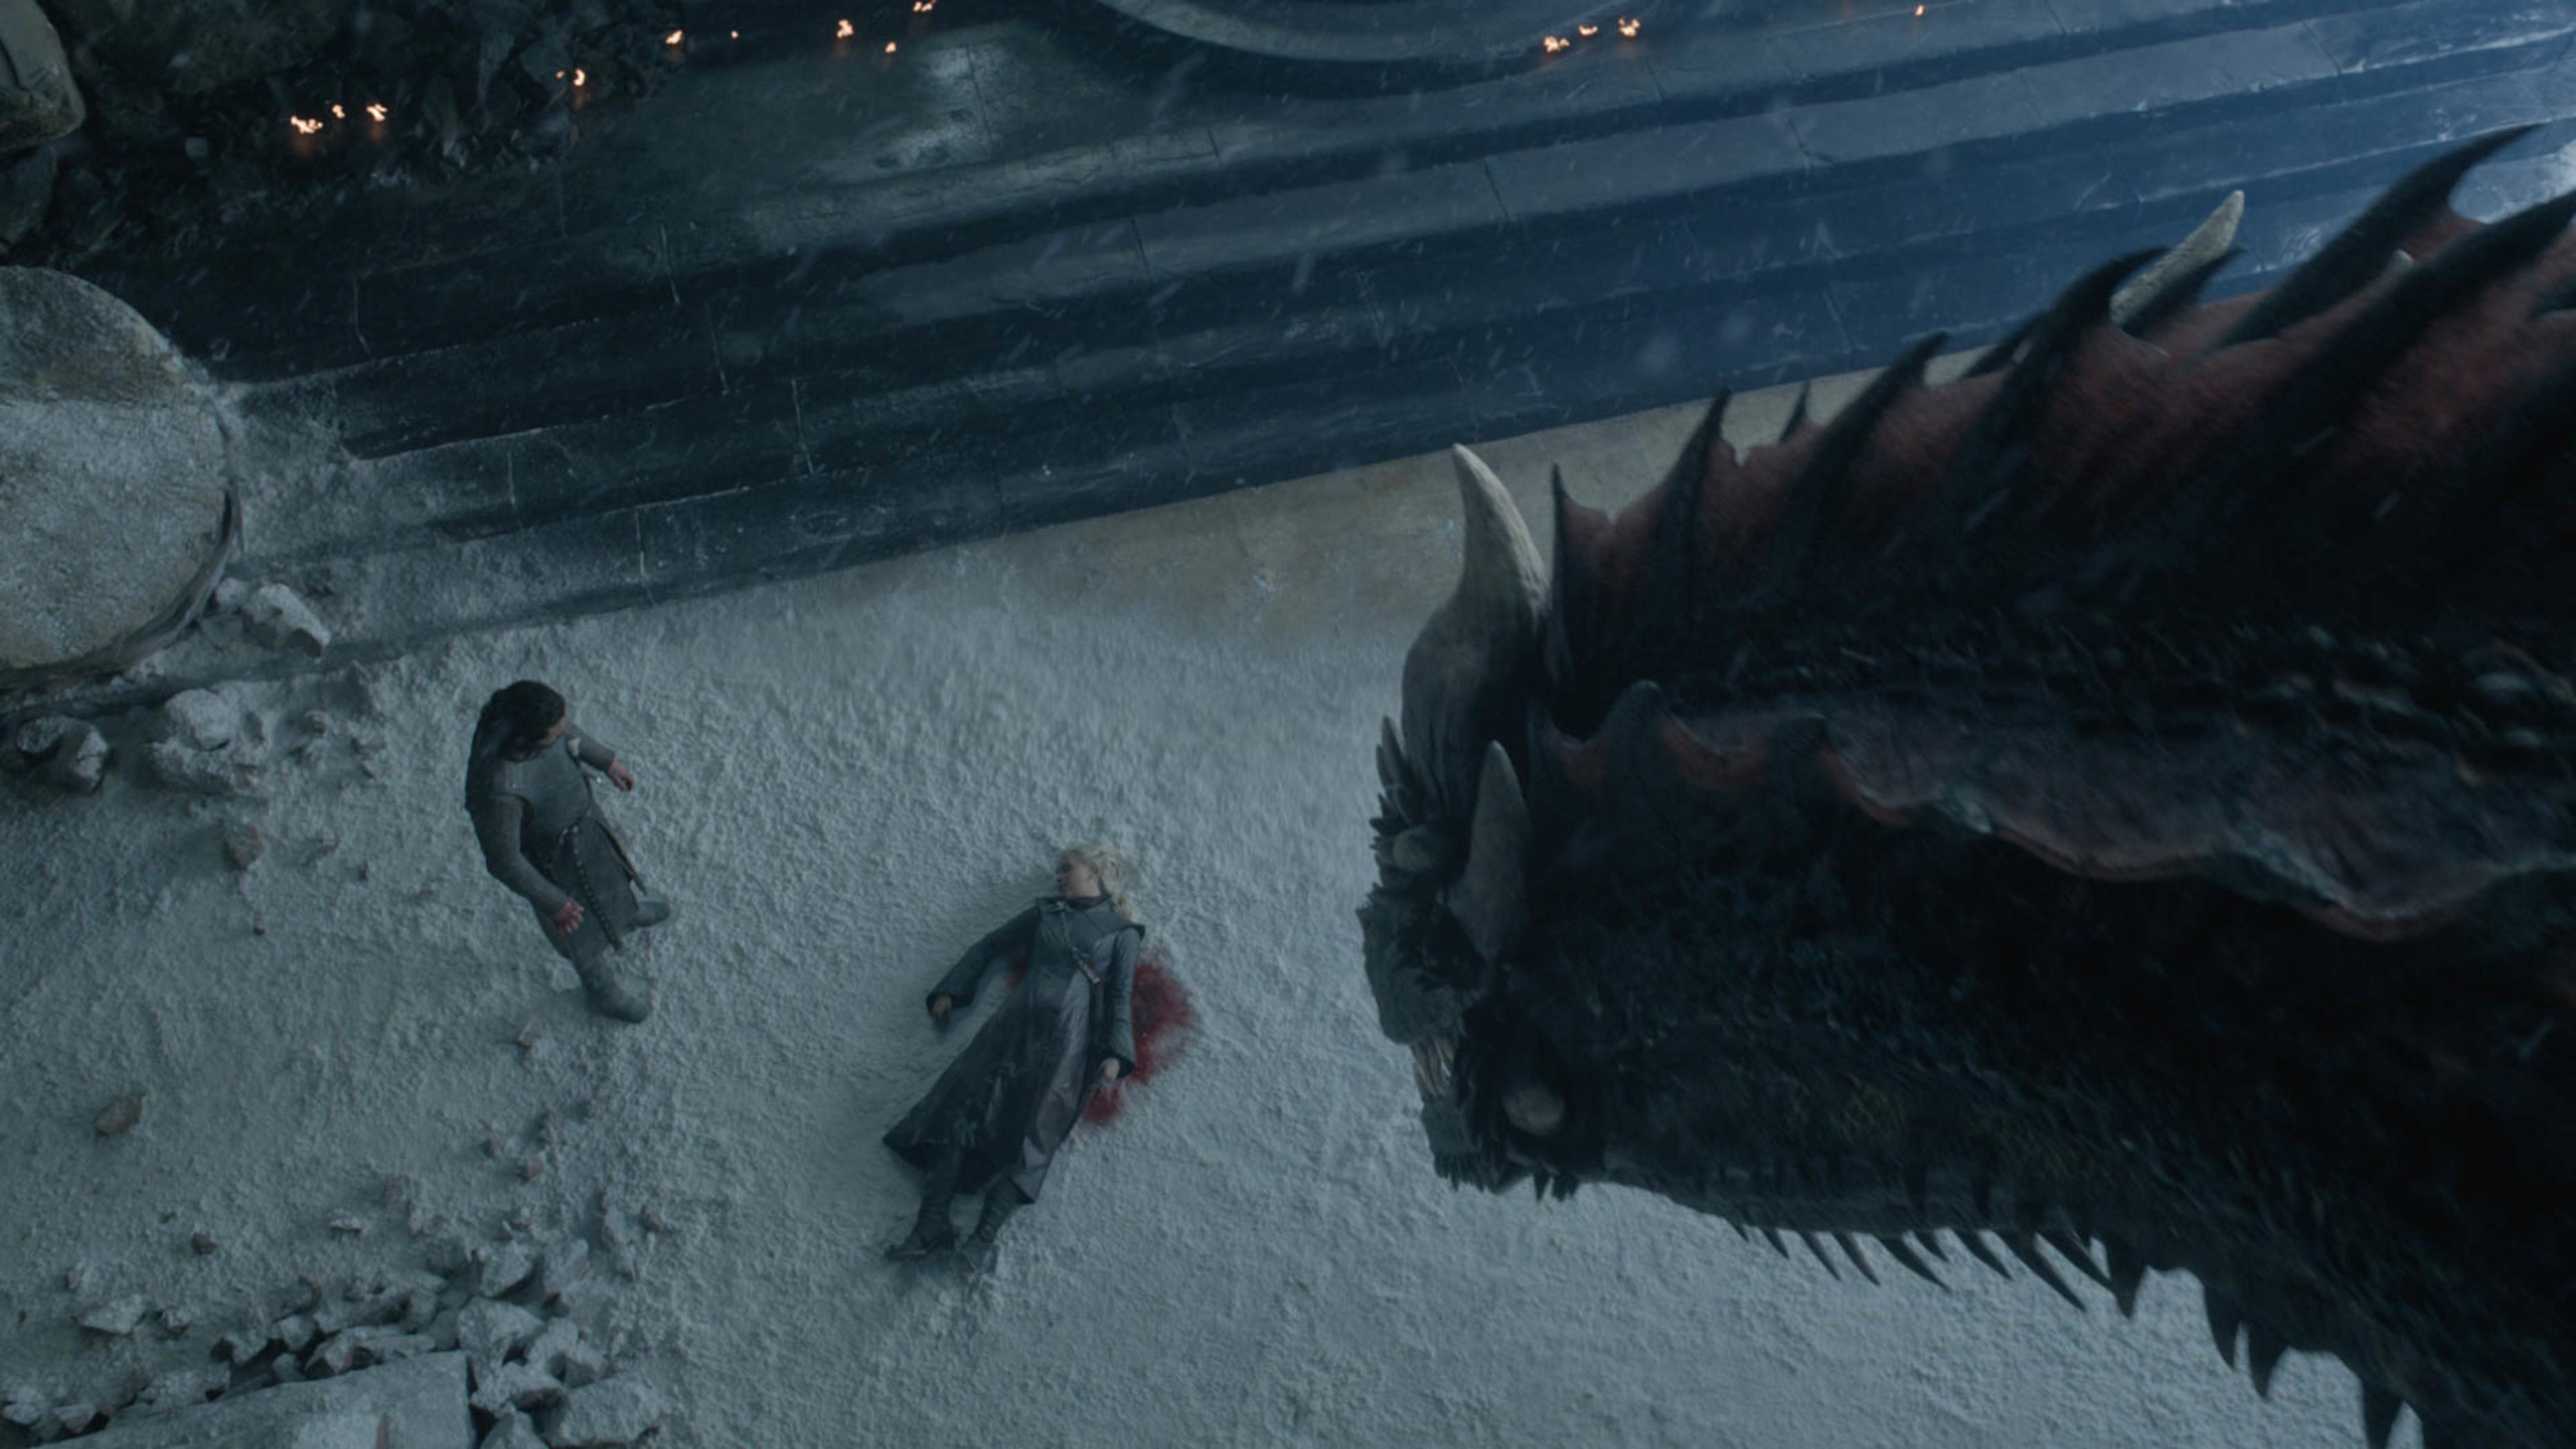 Assassination of Daenerys Targaryen